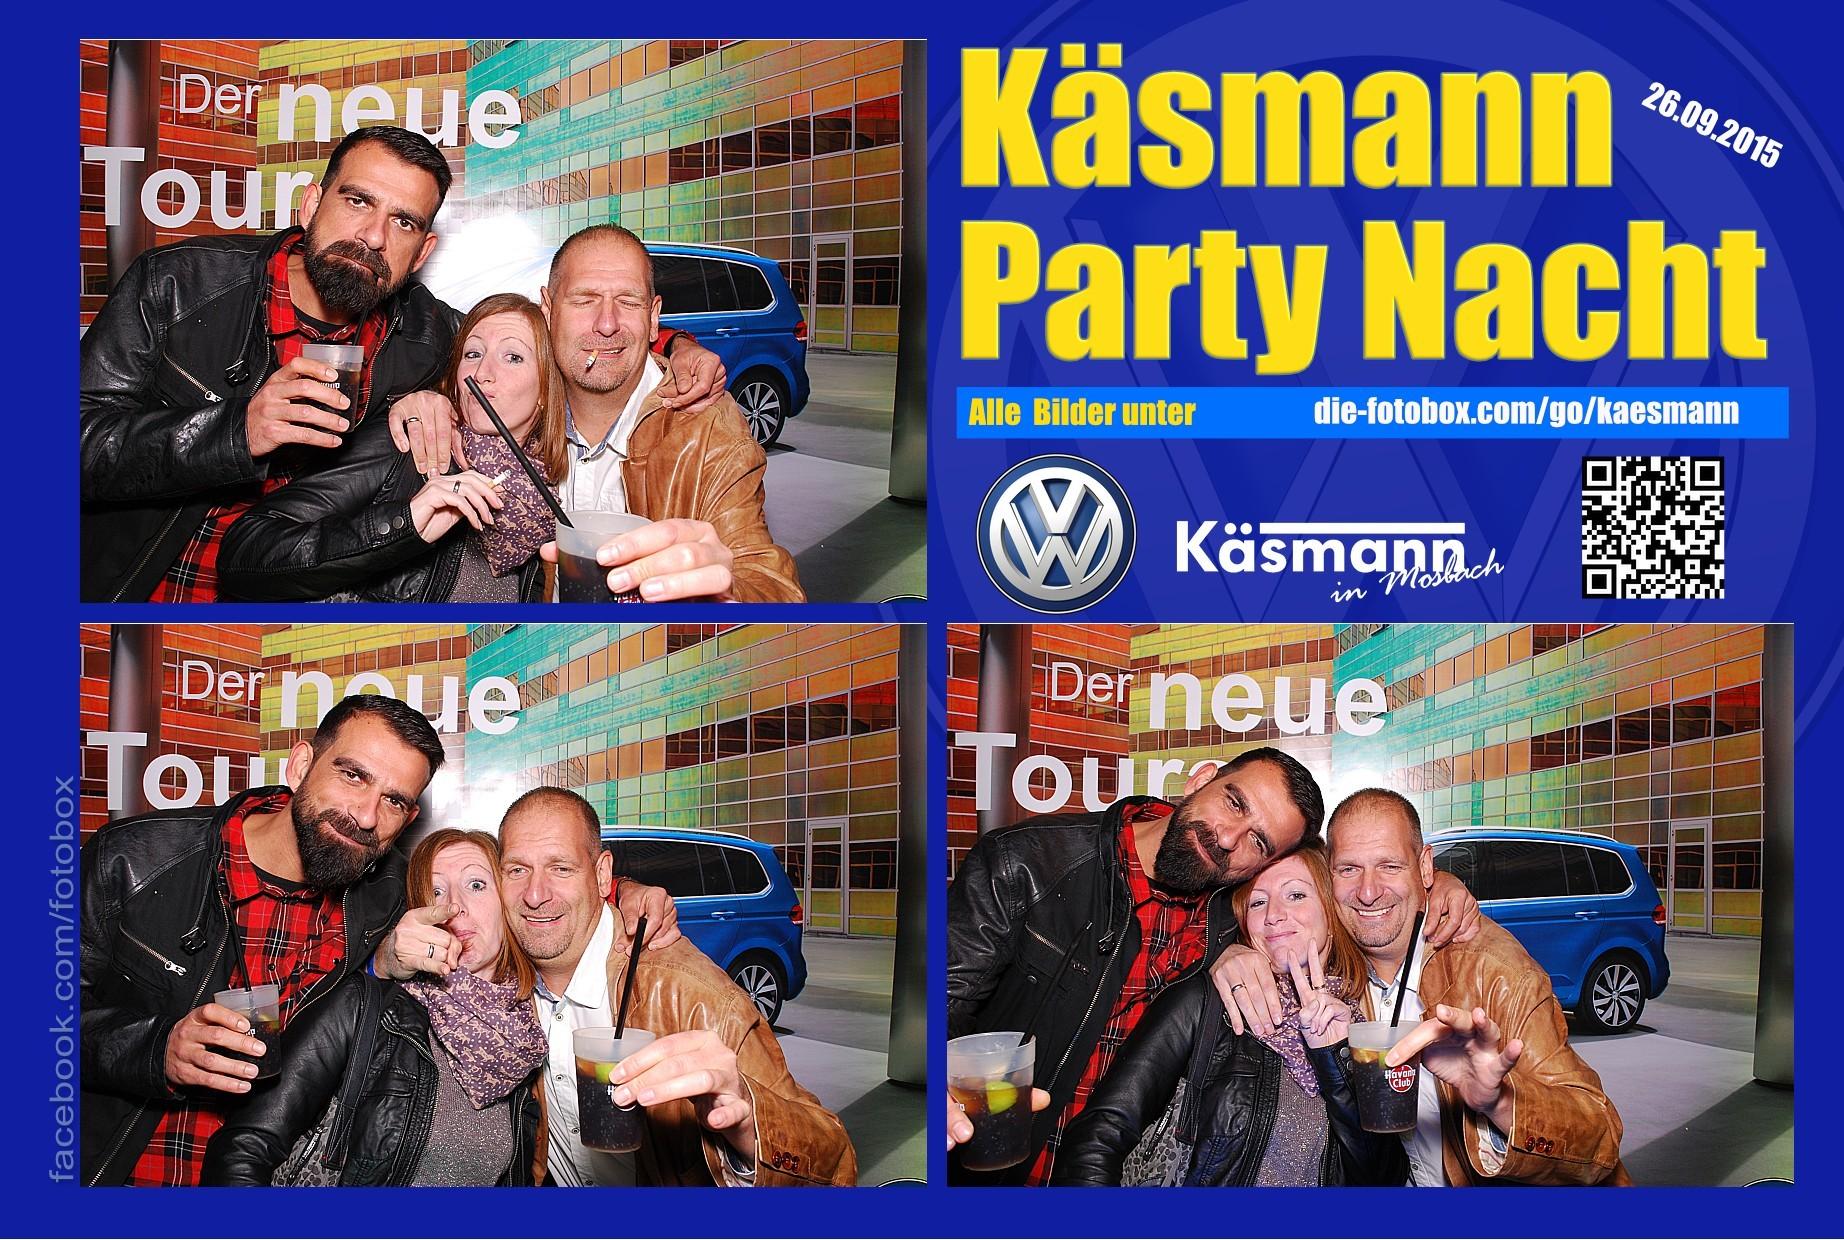 Käsmannparty 2015 - www.die-fotobox.com 01276